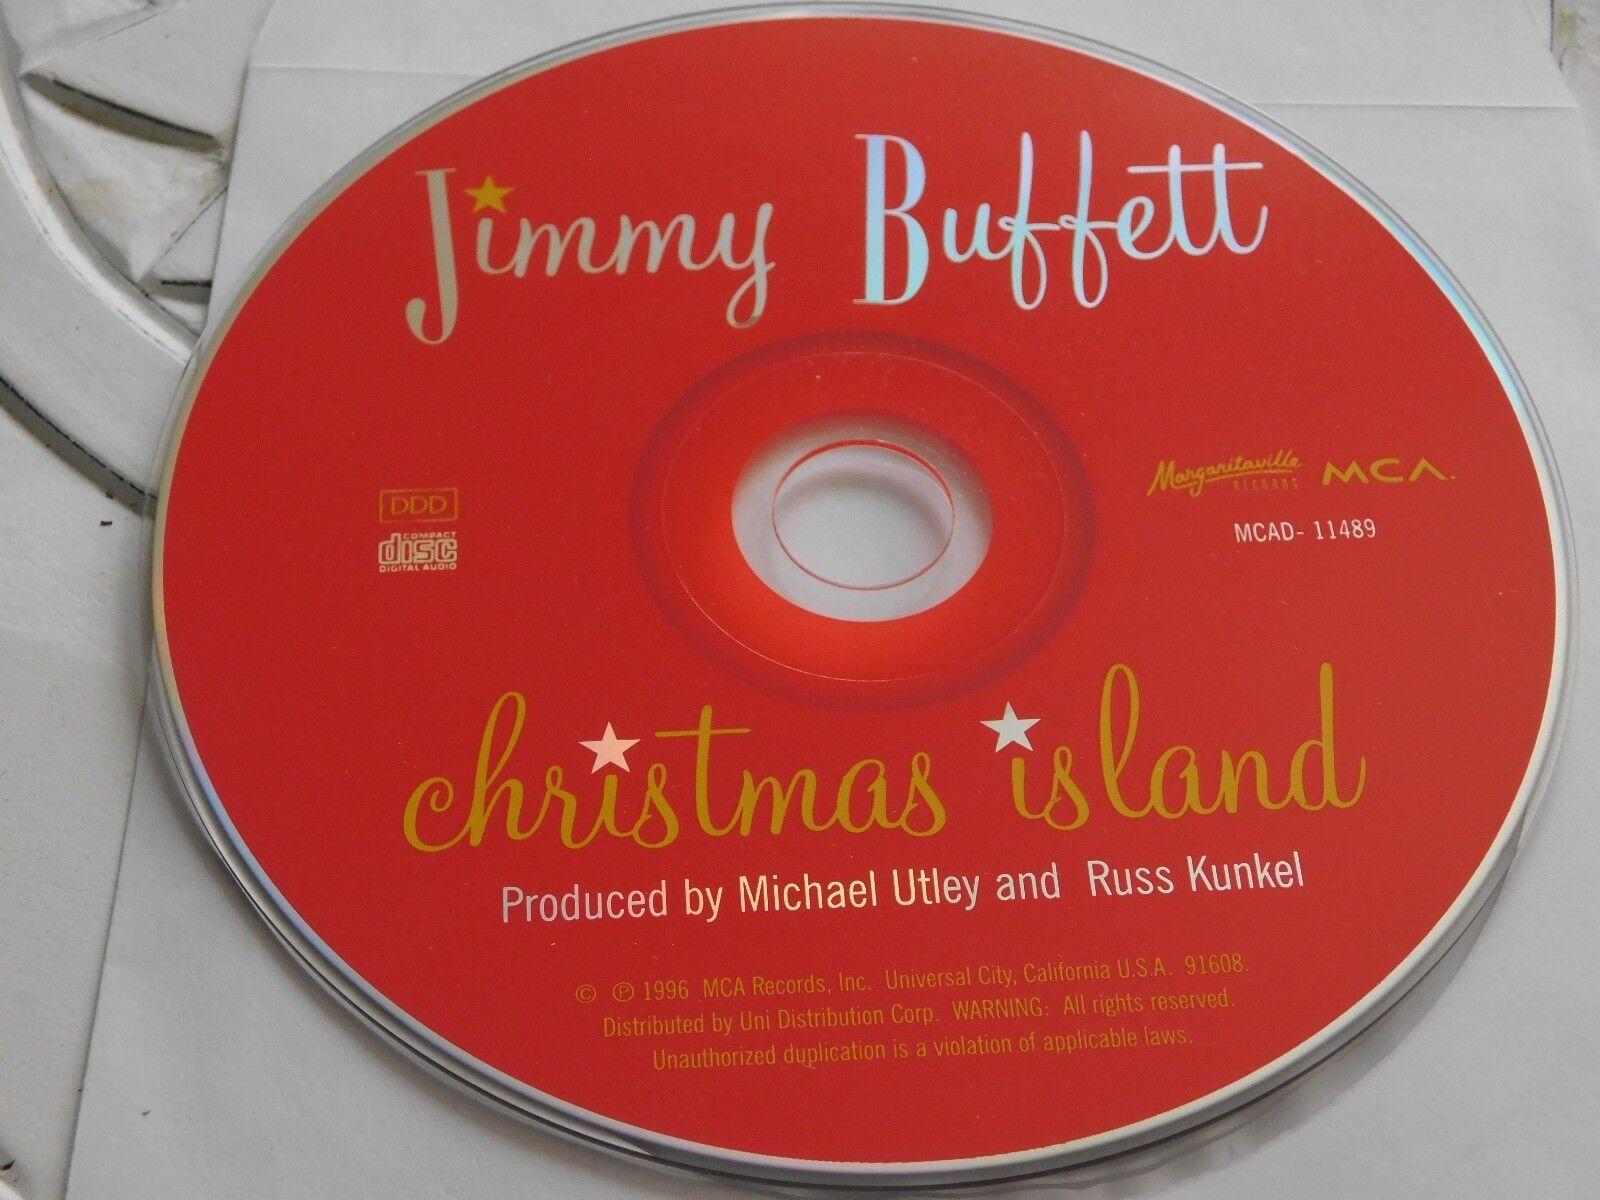 Christmas Island by Jimmy Buffett (CD, Delta Distribution) | eBay